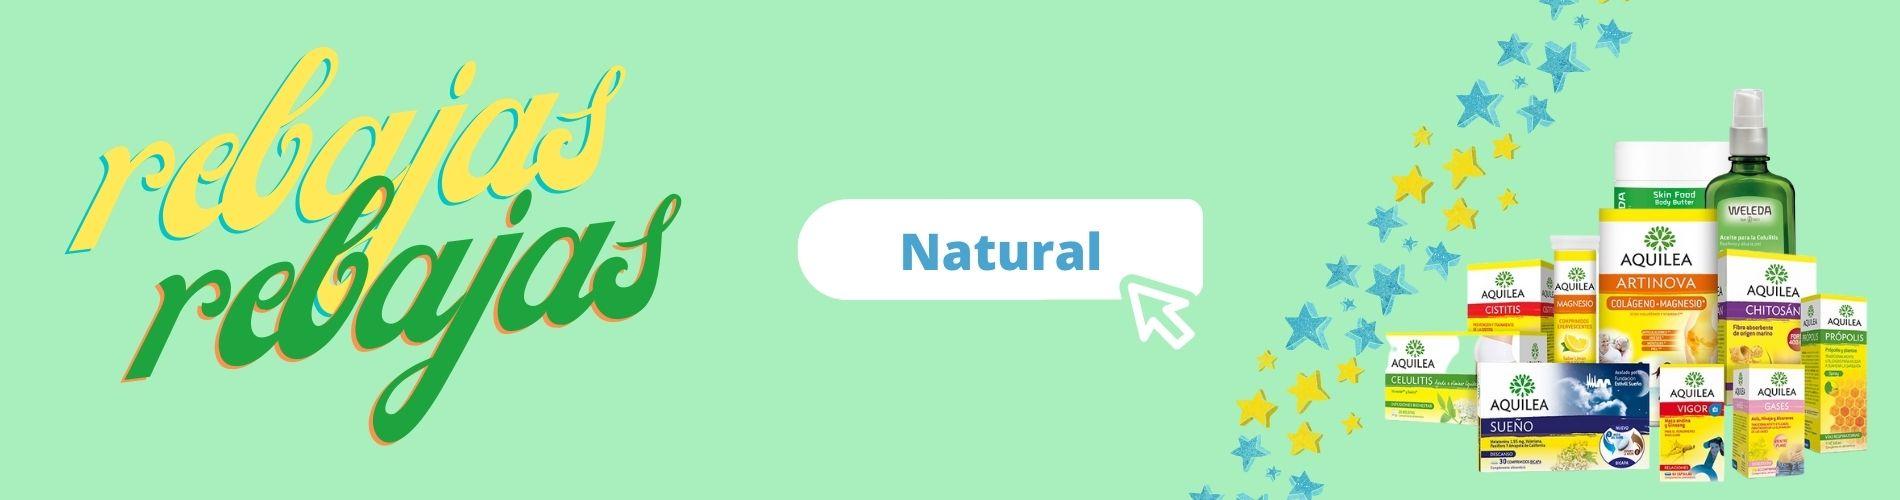 descuento en zona natural